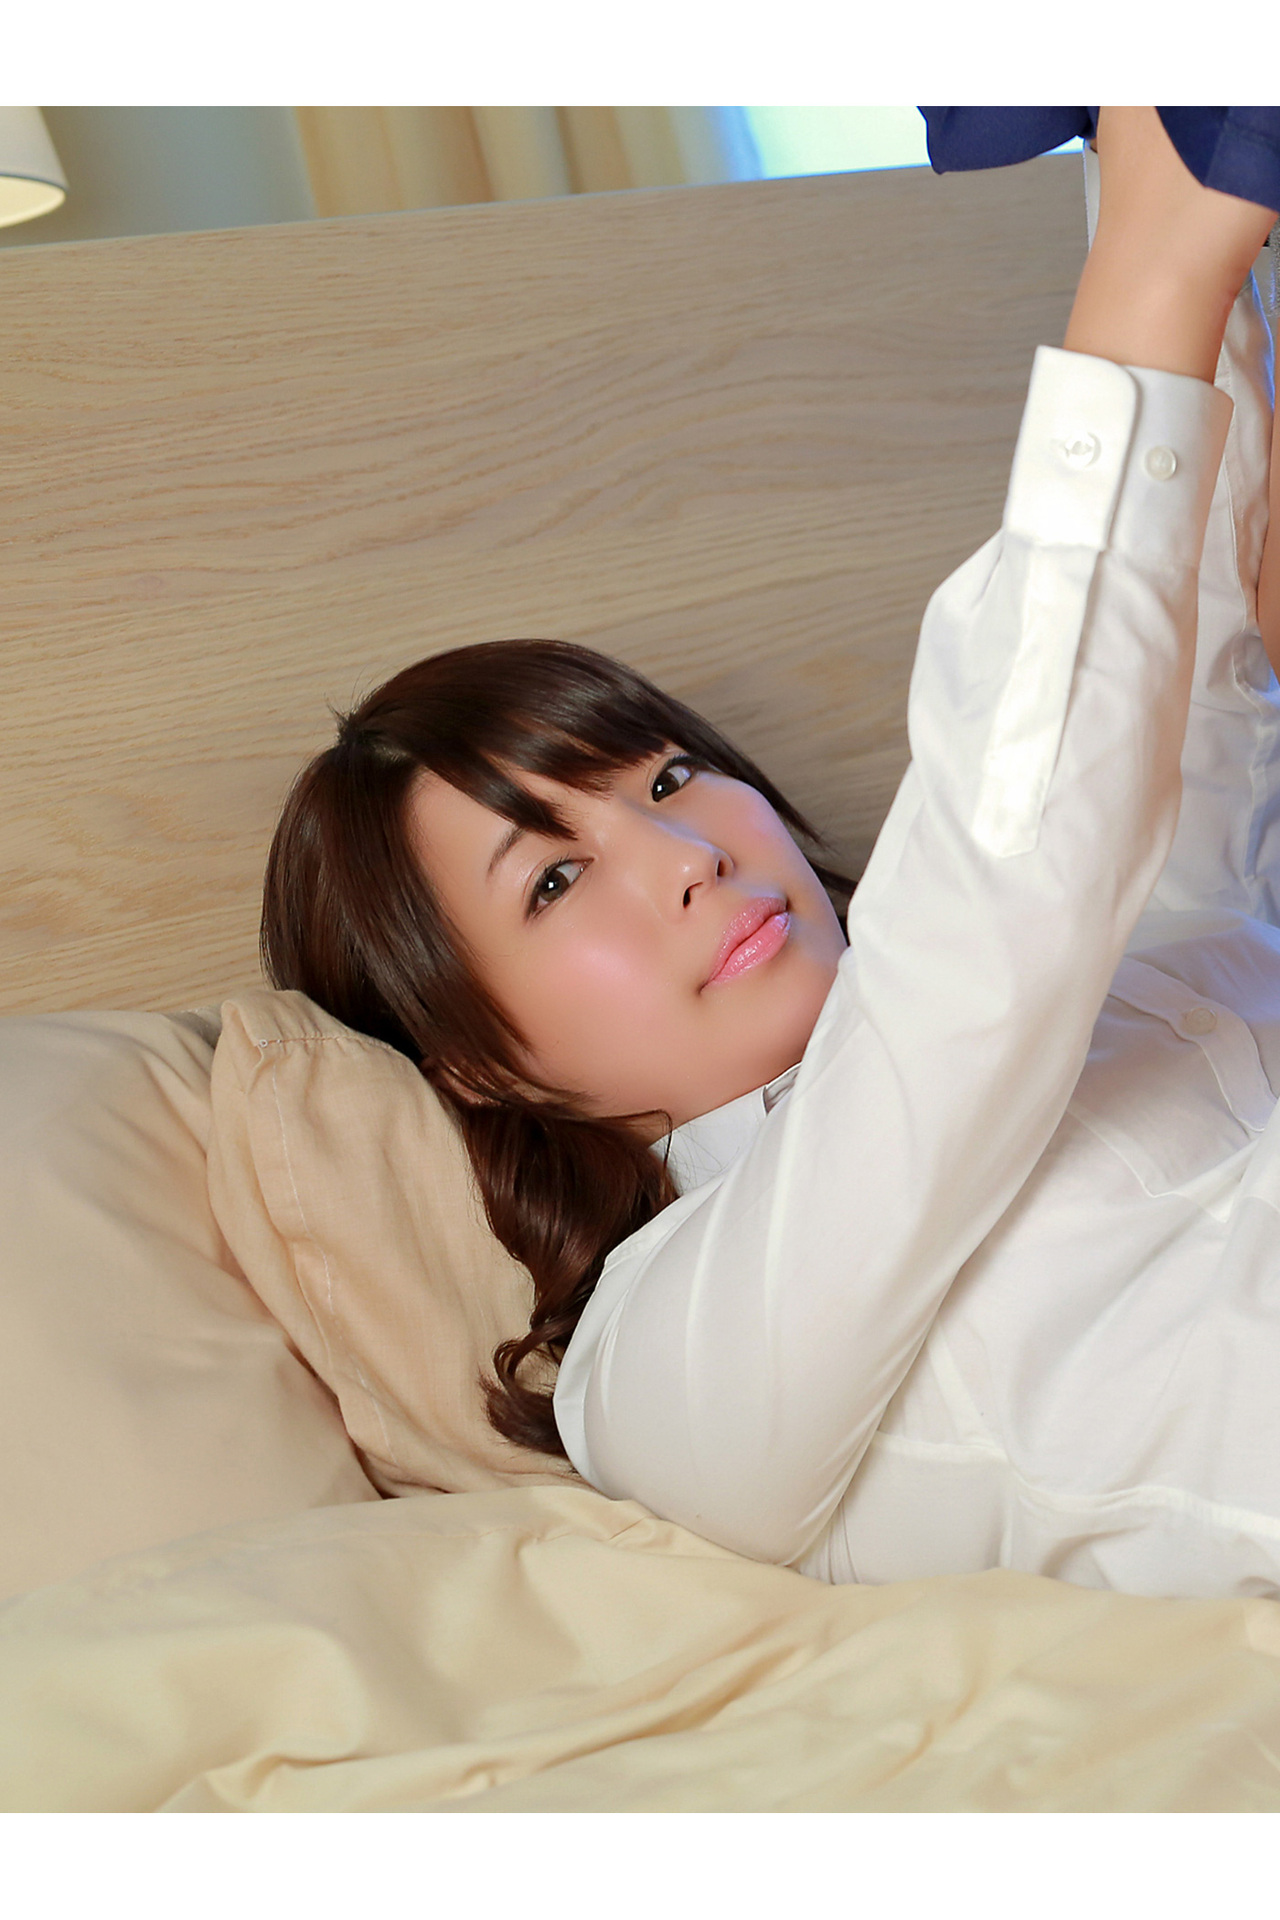 Rina Hashimoto039